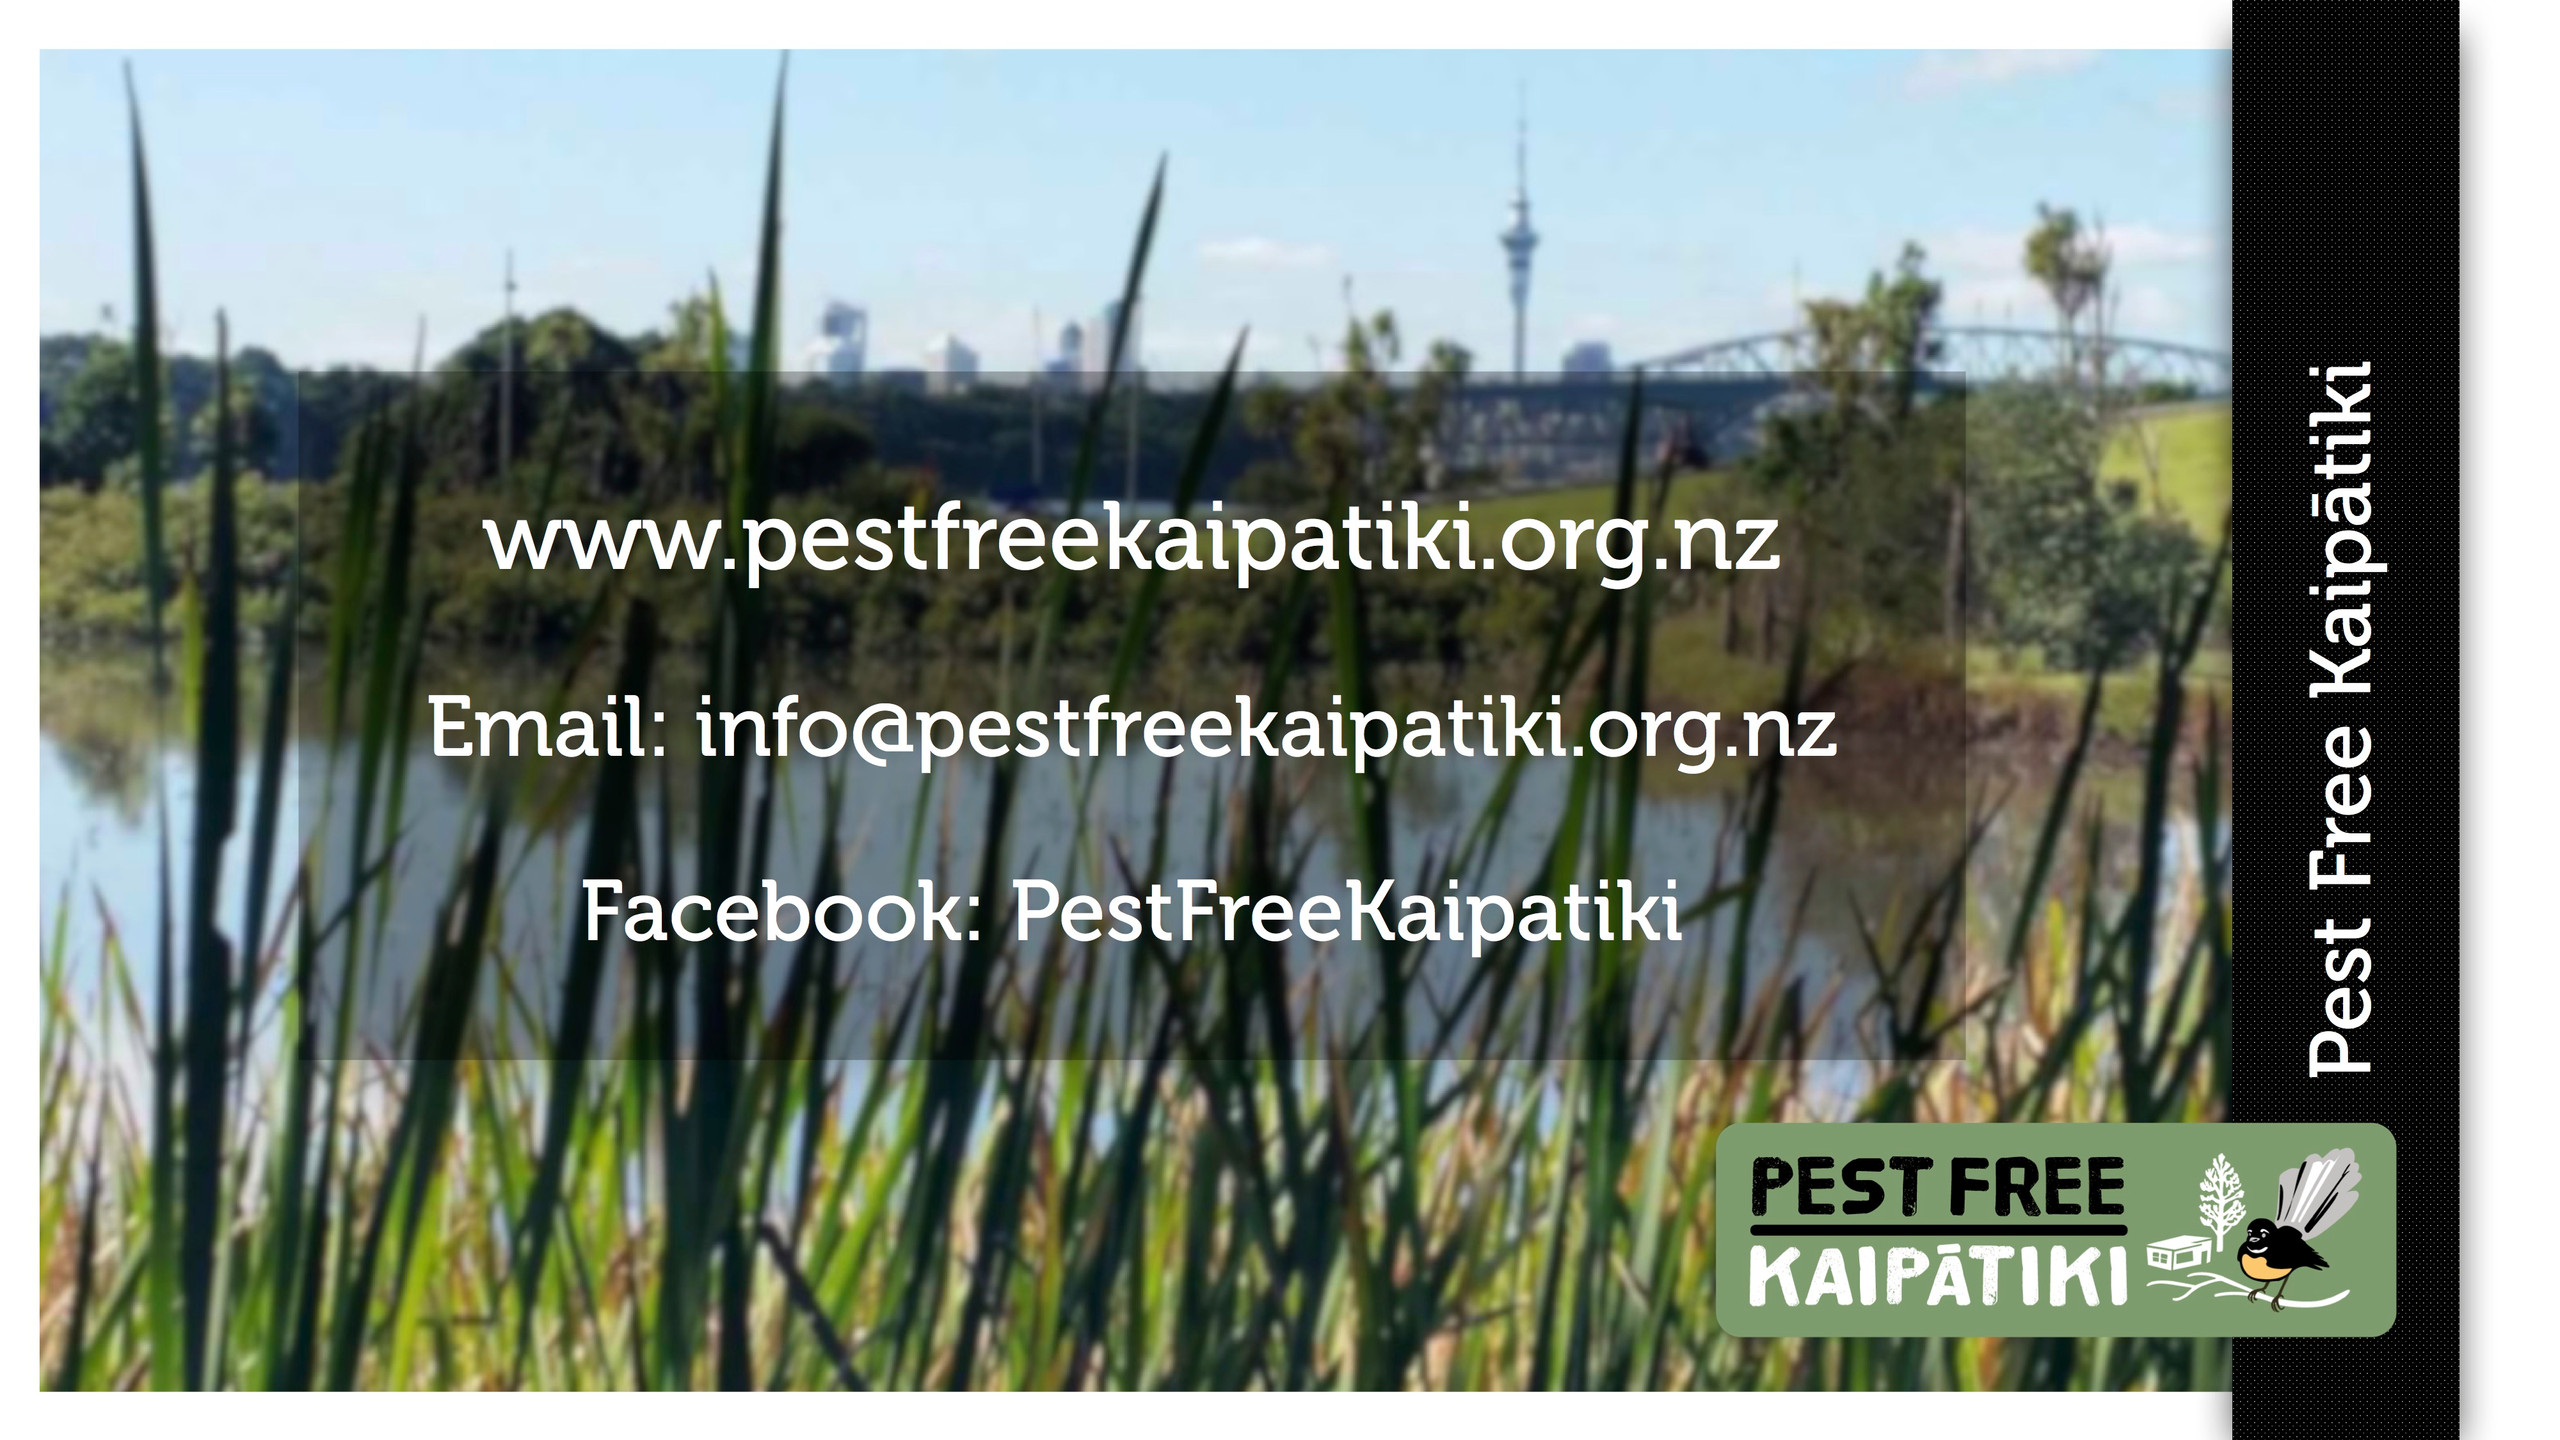 Pest Free Kaipatiki-Pestival-slide18